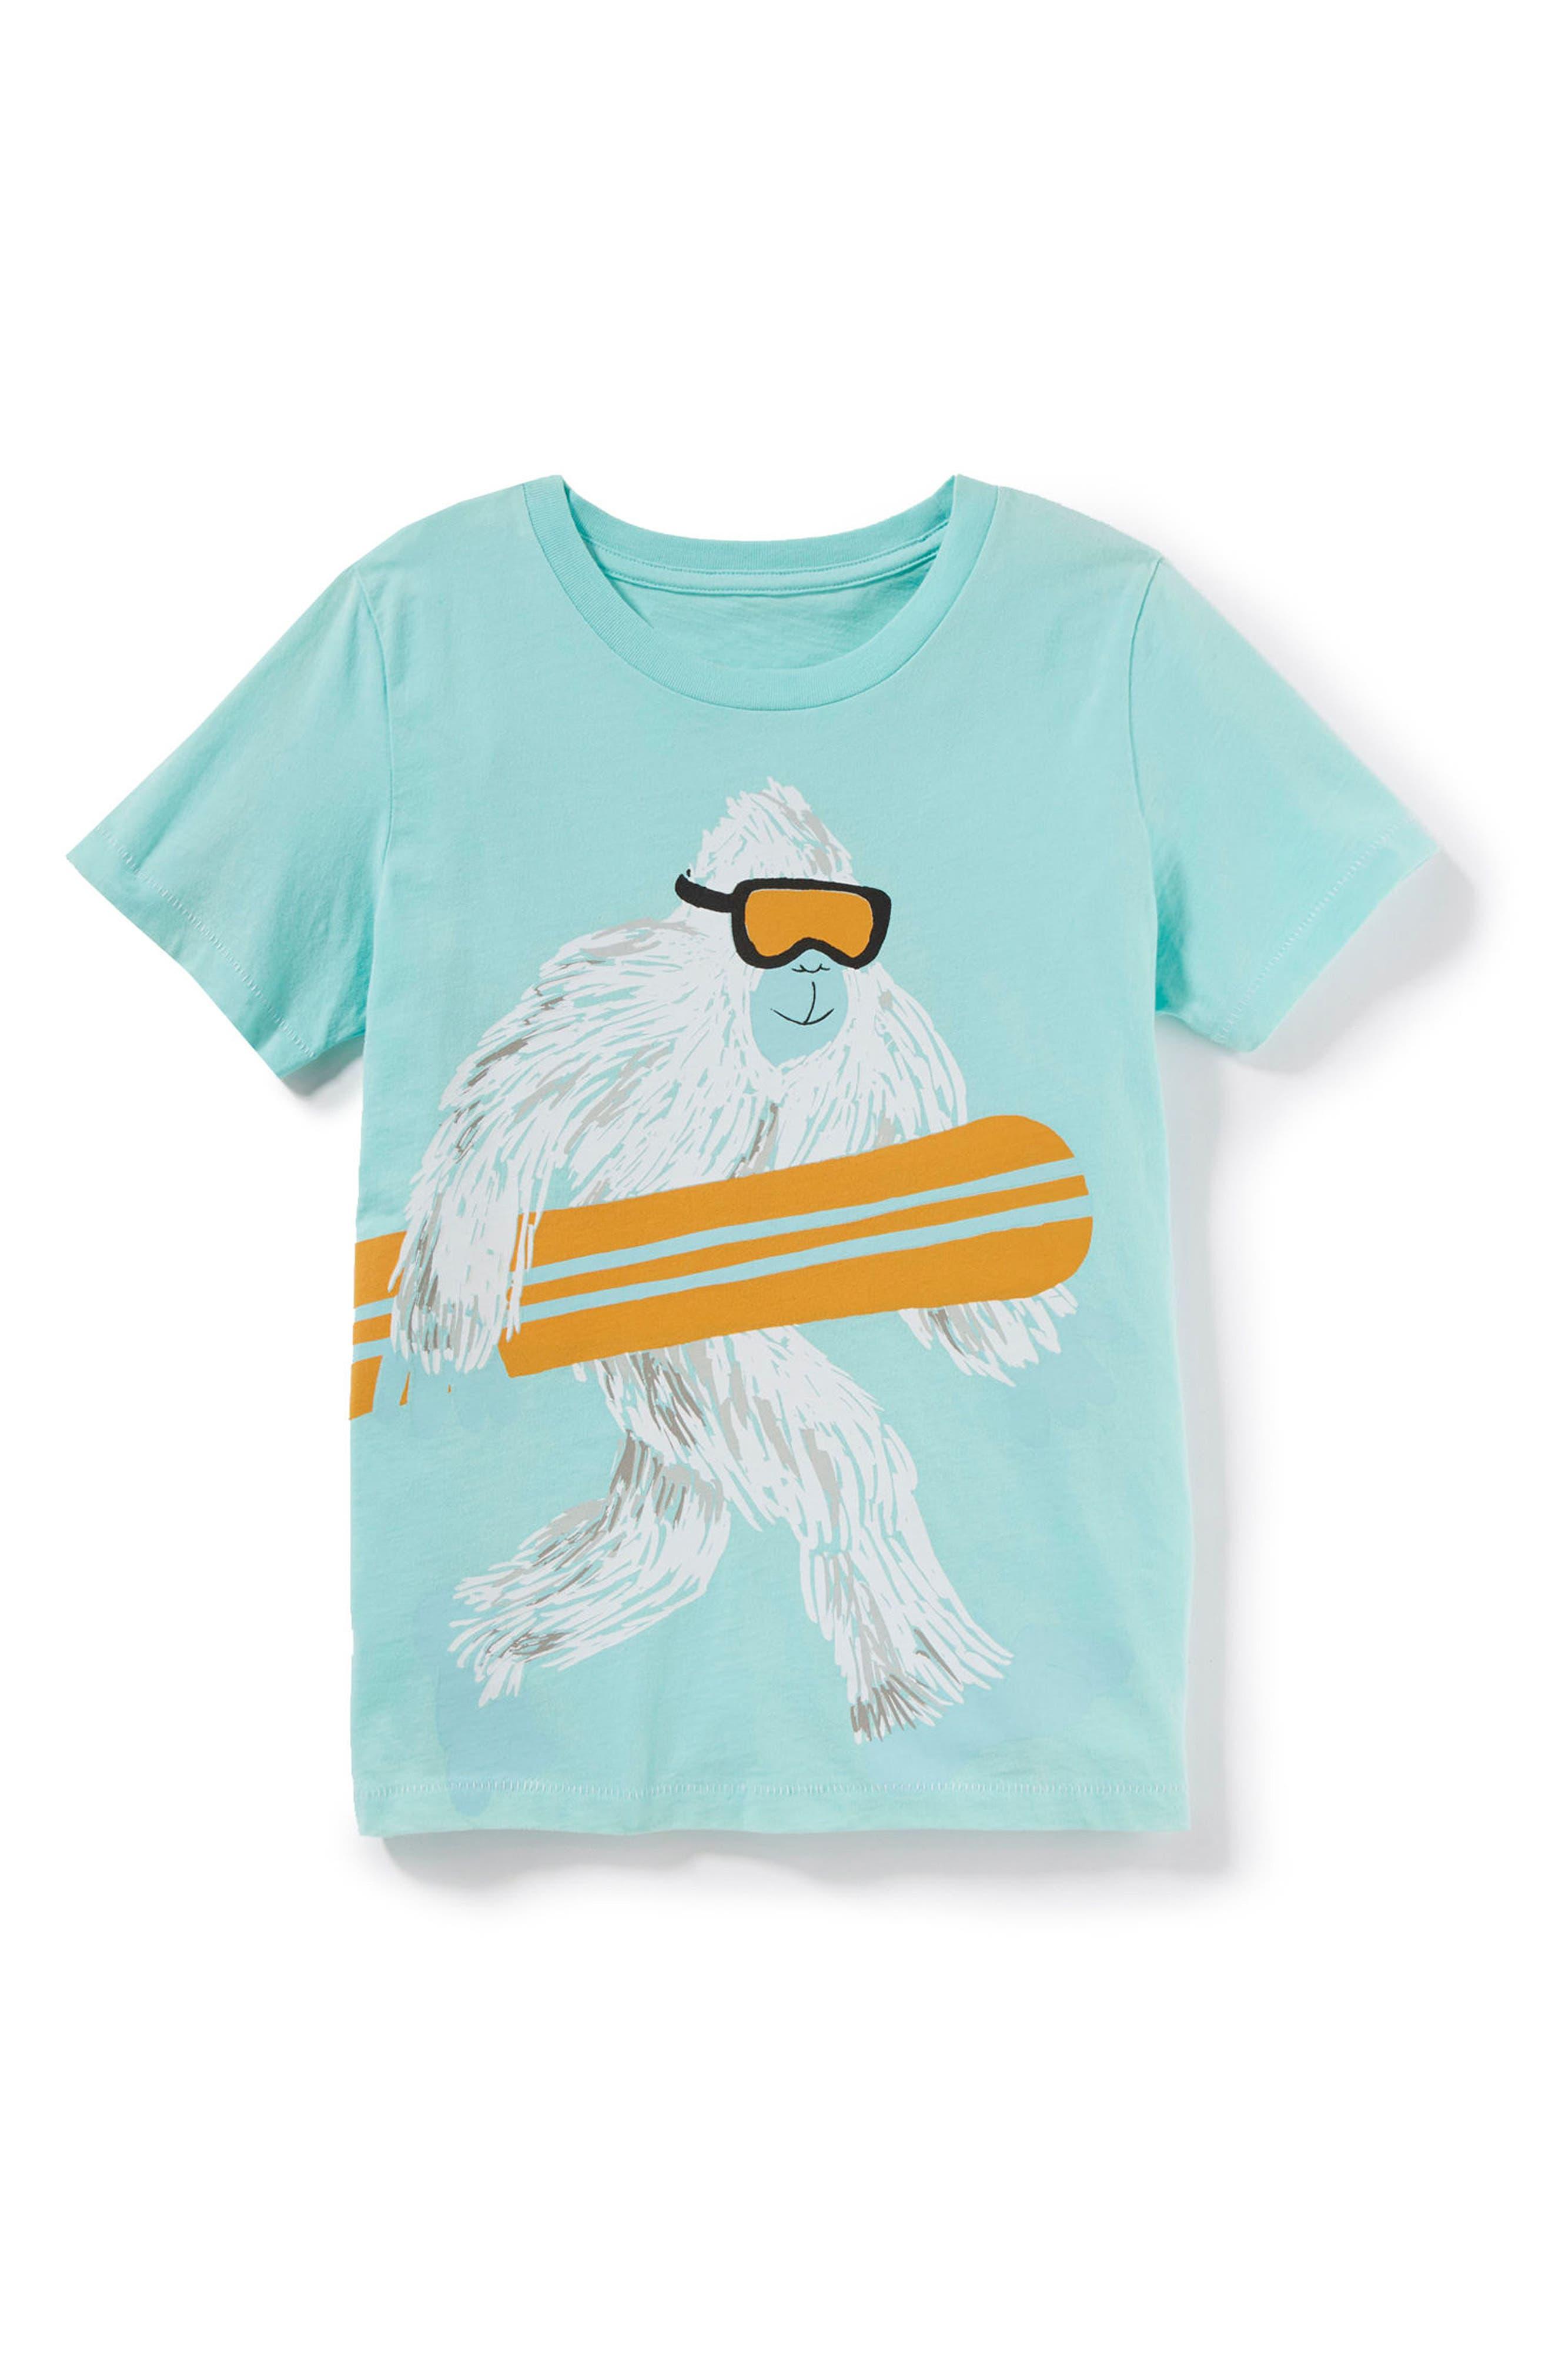 Alternate Image 1 Selected - Peek Yeti Snowboard Graphic T-Shirt (Toddler Boys, Little Boys & Big Boys)